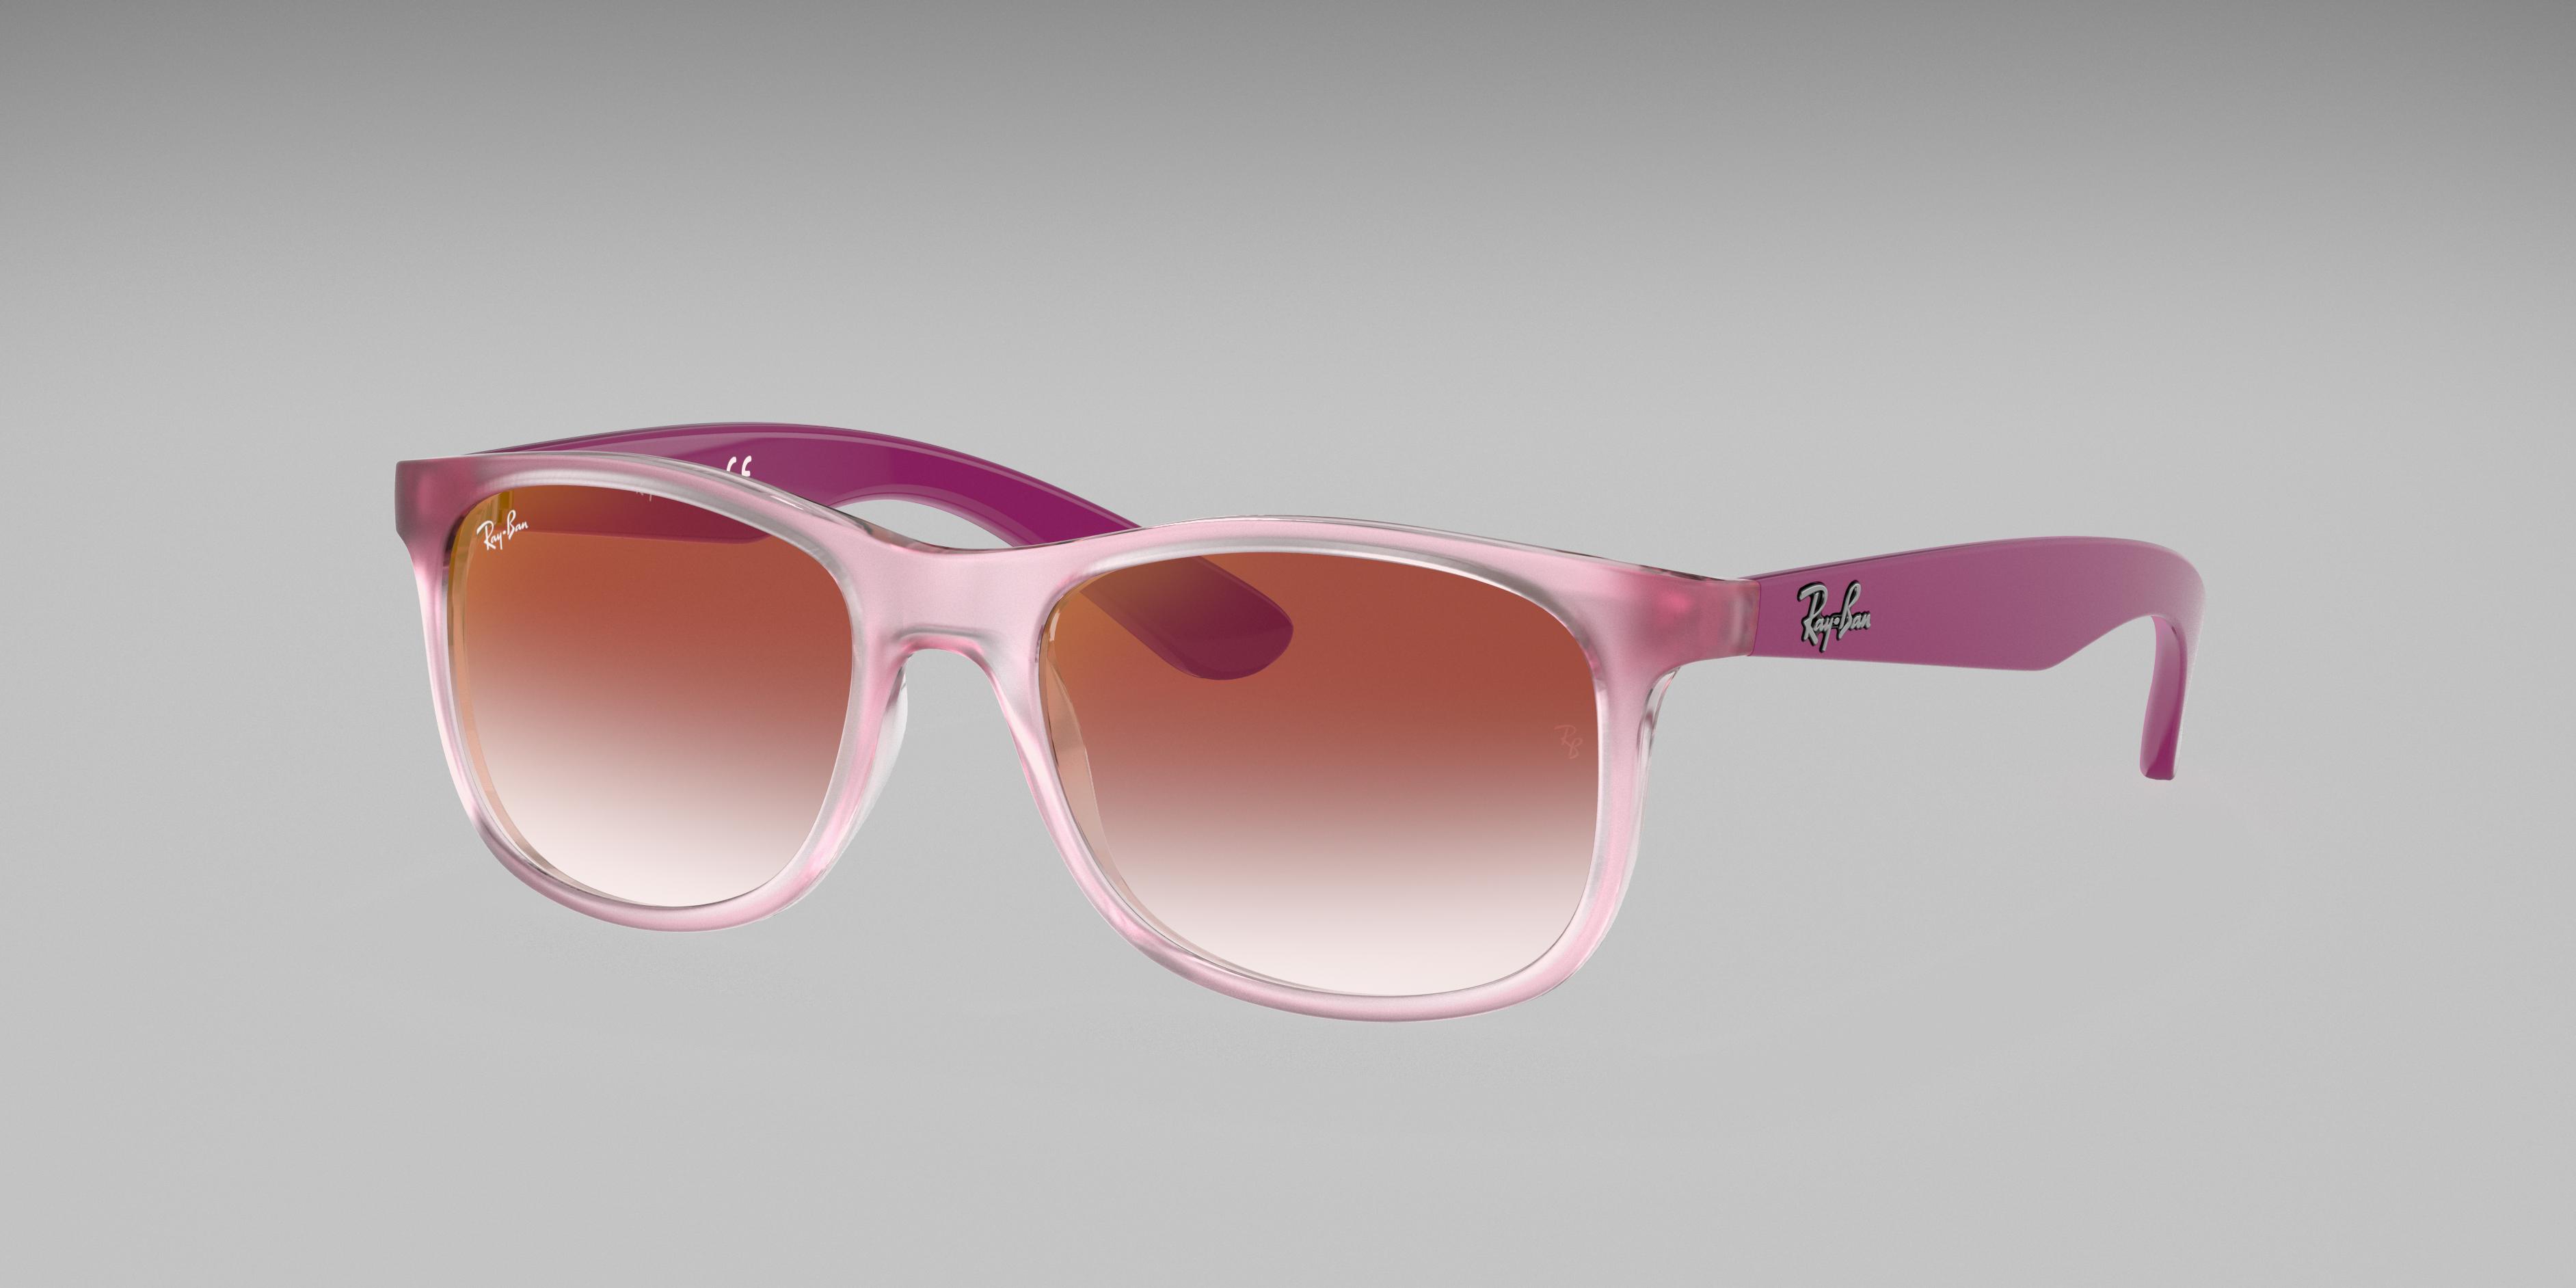 Ray-Ban Rj9062s Pink, Red Lenses - RJ9062S